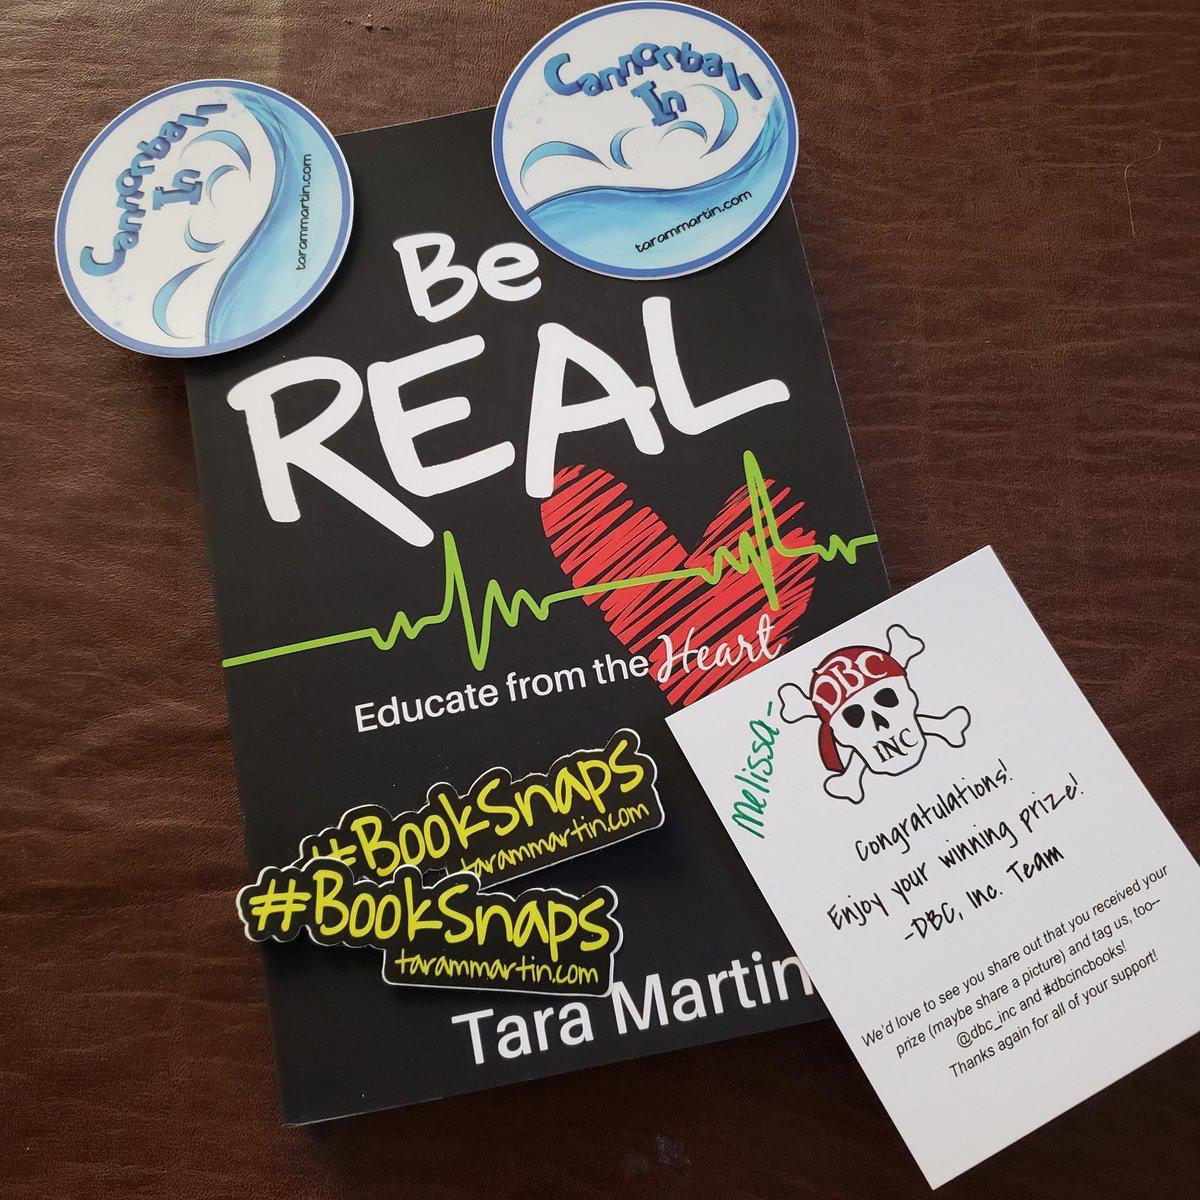 So excited to read my new book! Thank you @TaraMartinEDU @dbc_inc #dbcincbooks #beREAL #booksnaps